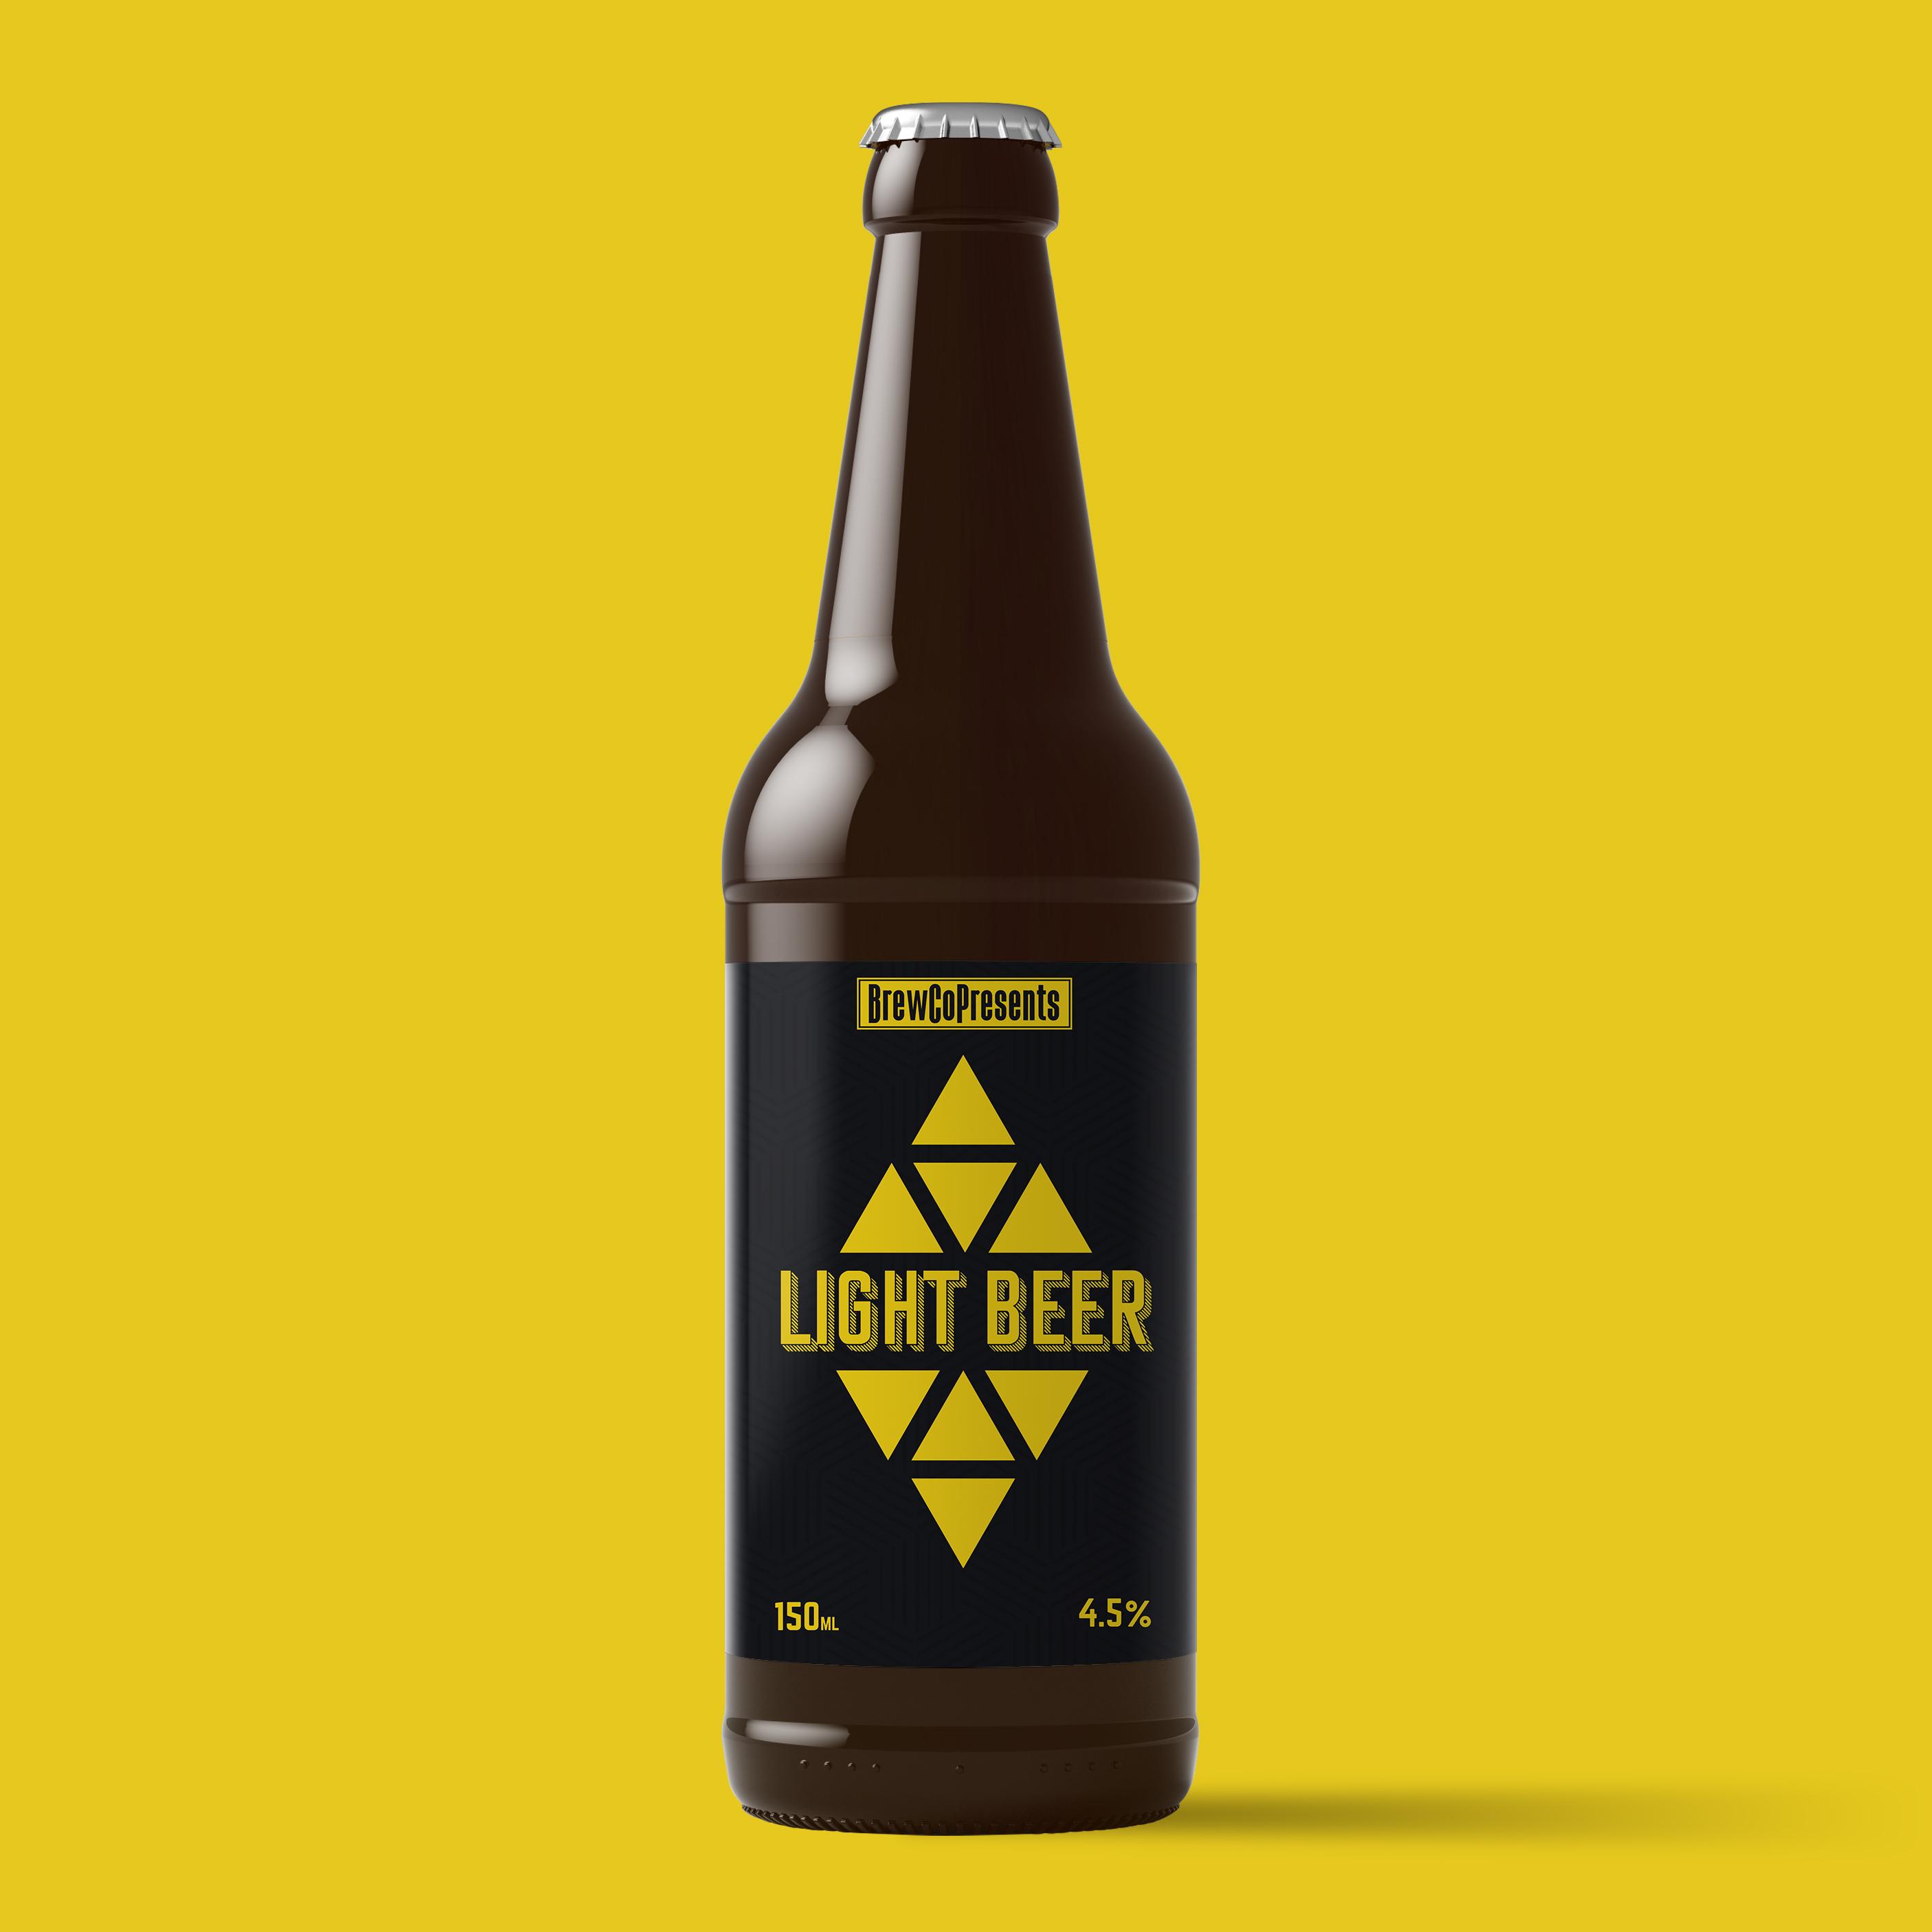 light beer label